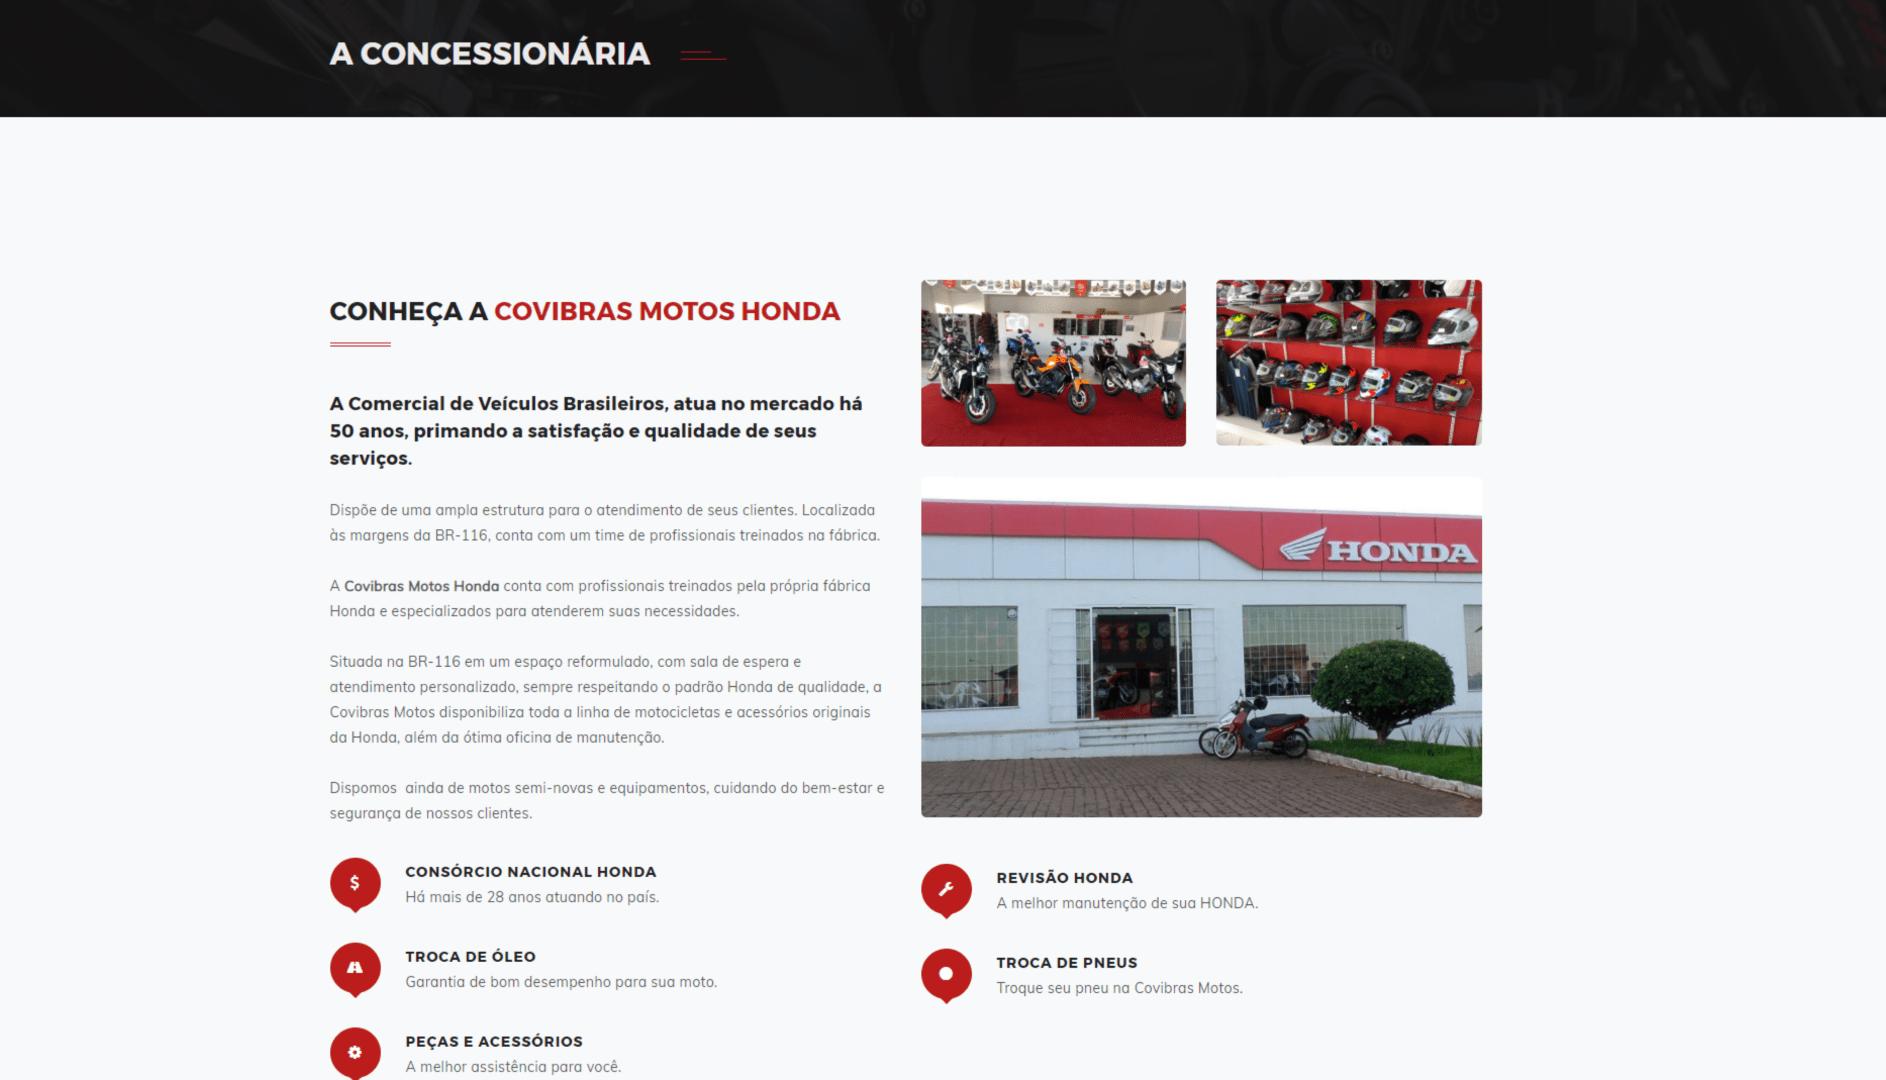 https://www.6i.com.br/case/covibras/